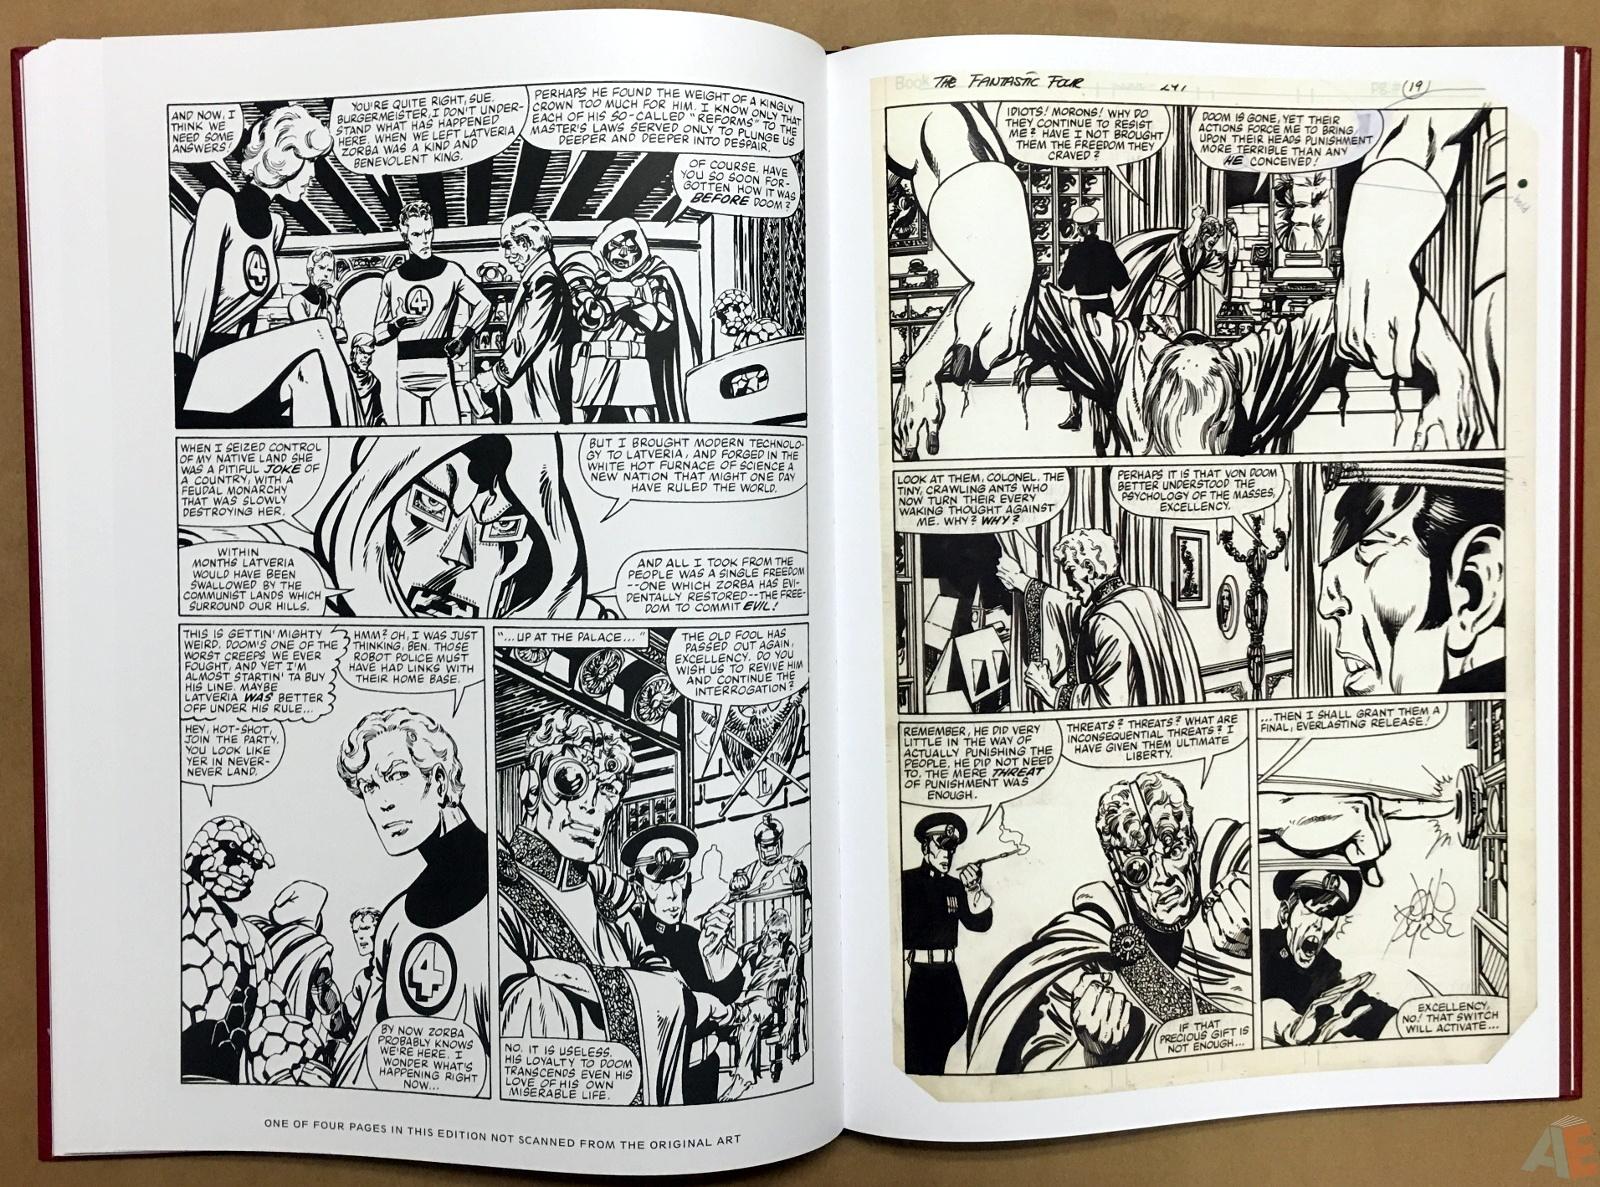 John Byrne's The Fantastic Four Artist's Edition 36